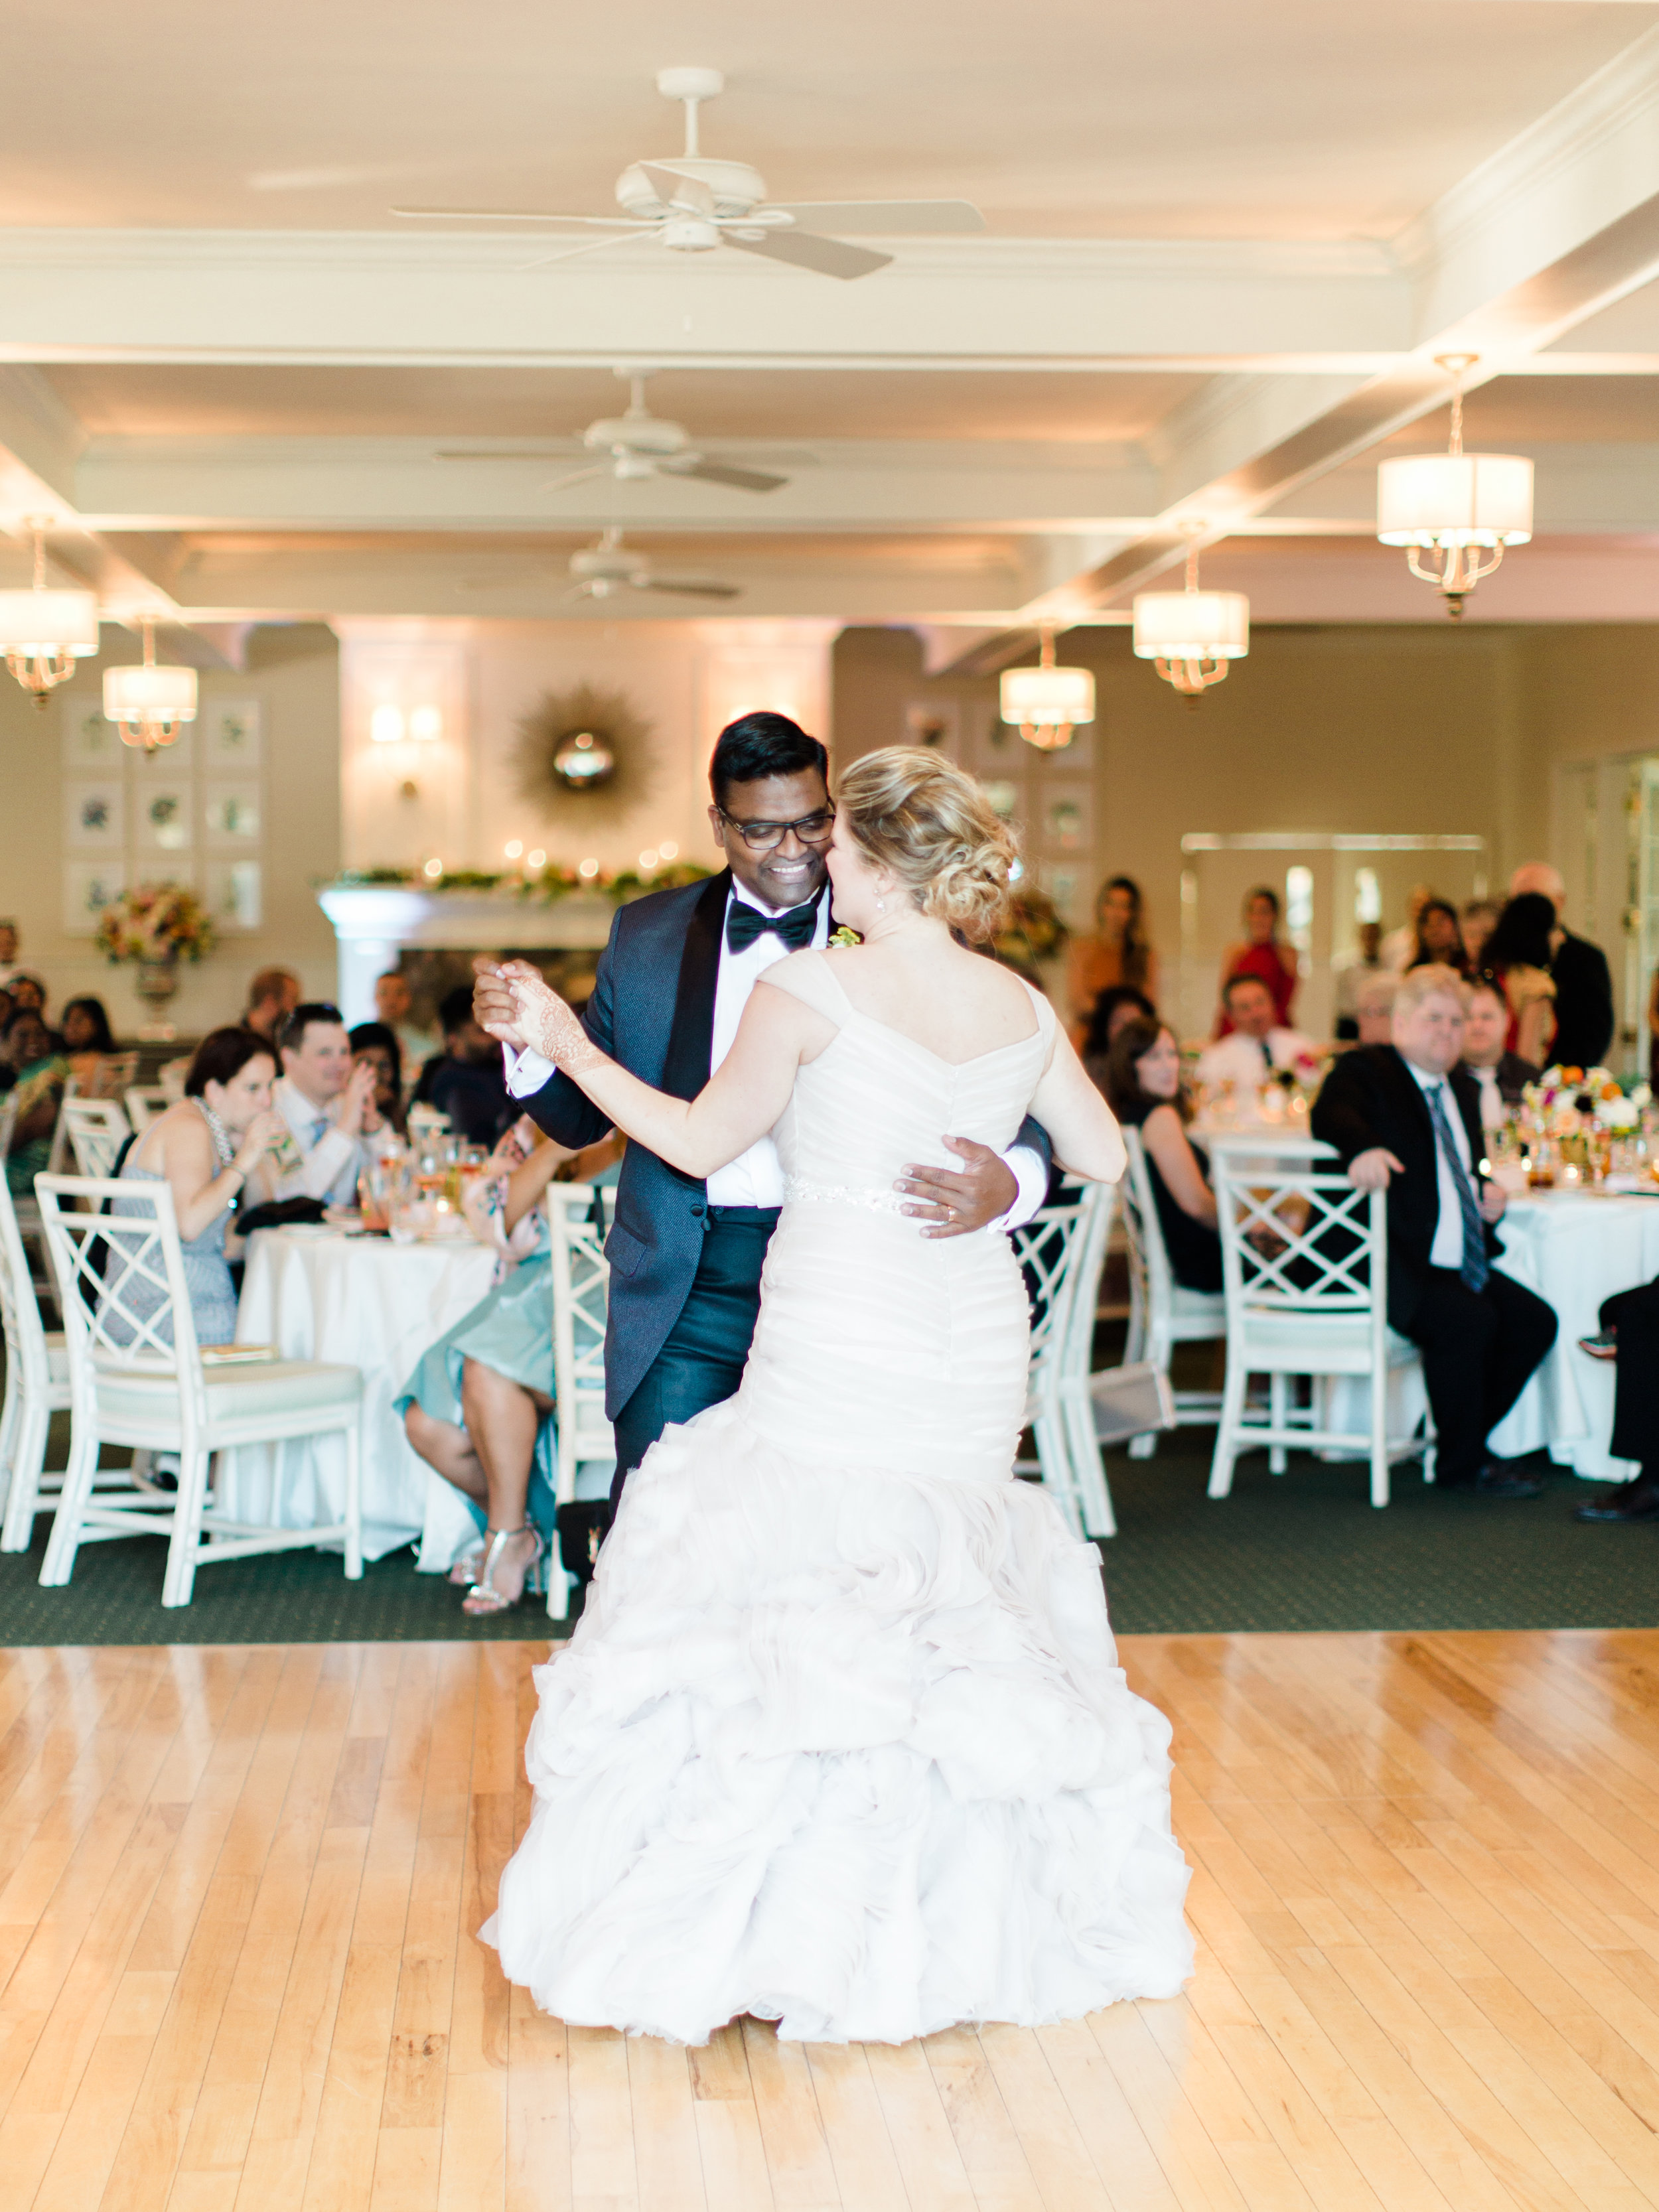 Govathoti+Wedding+Reception+BGFirst Dance-13.jpg